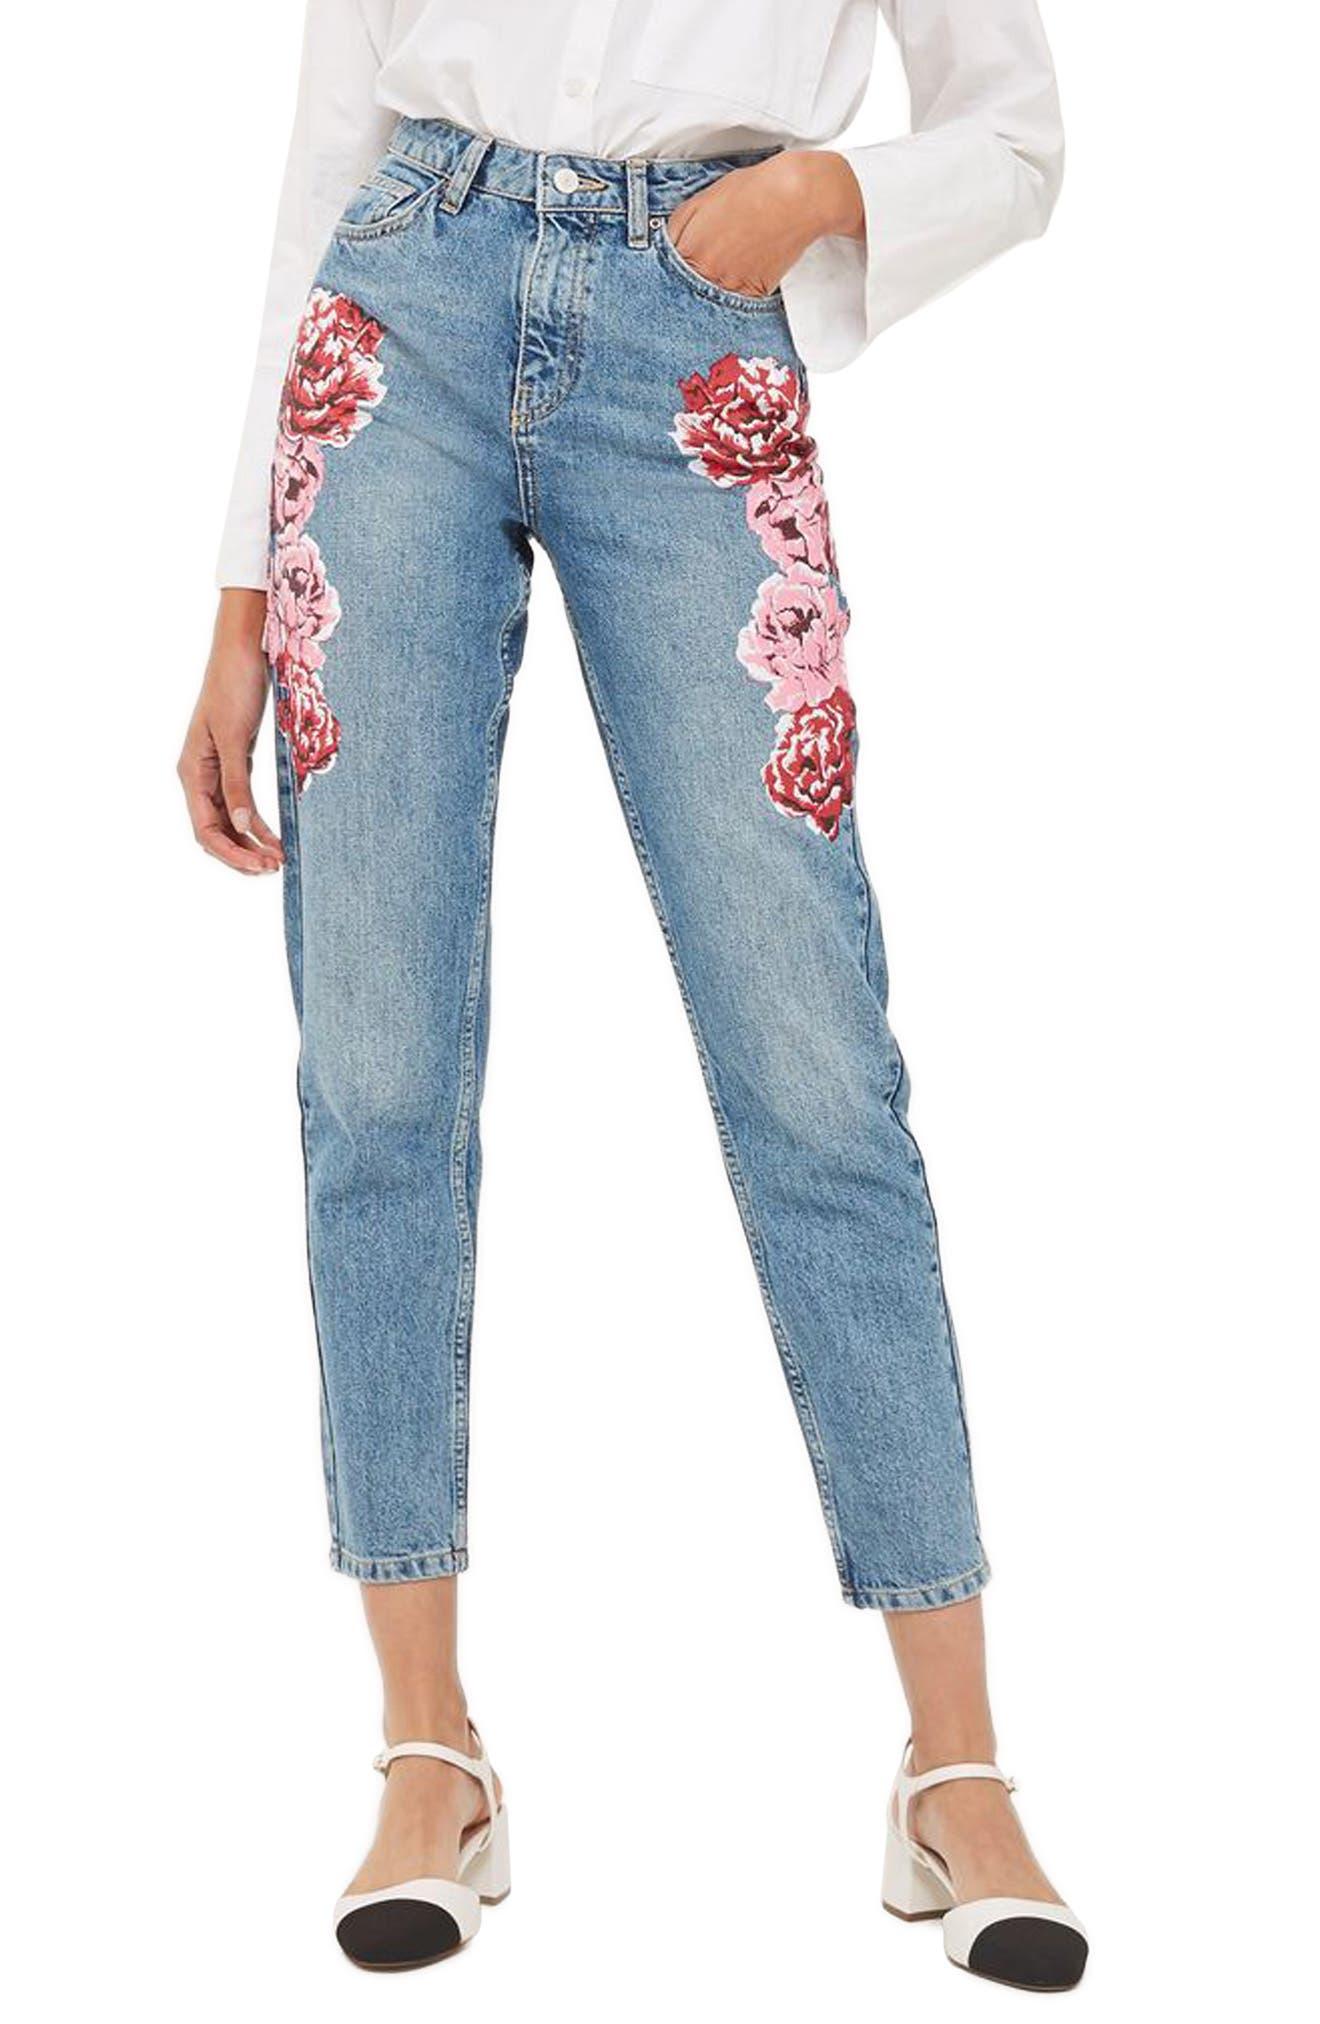 Alternate Image 1 Selected - Topshop Peony Print Crop Mom Jeans